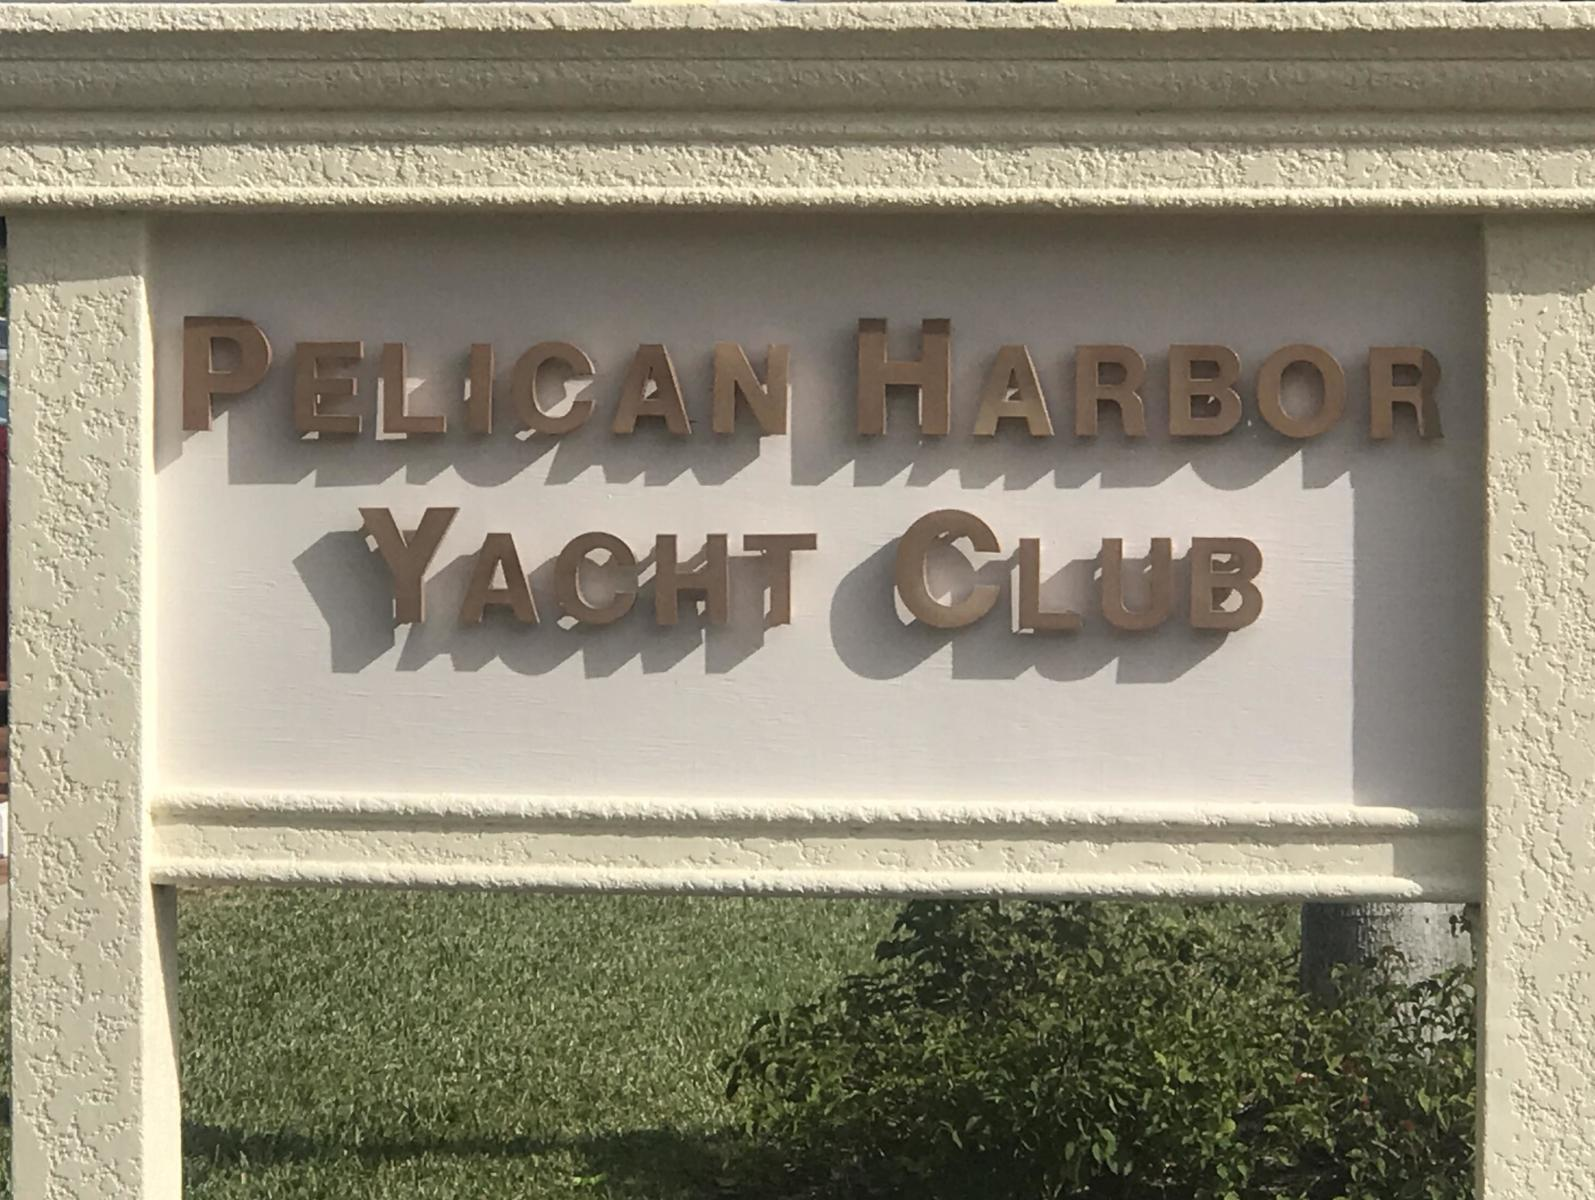 3481 Harbor Circle - 3/2 in PELICAN HARBOR PH 2